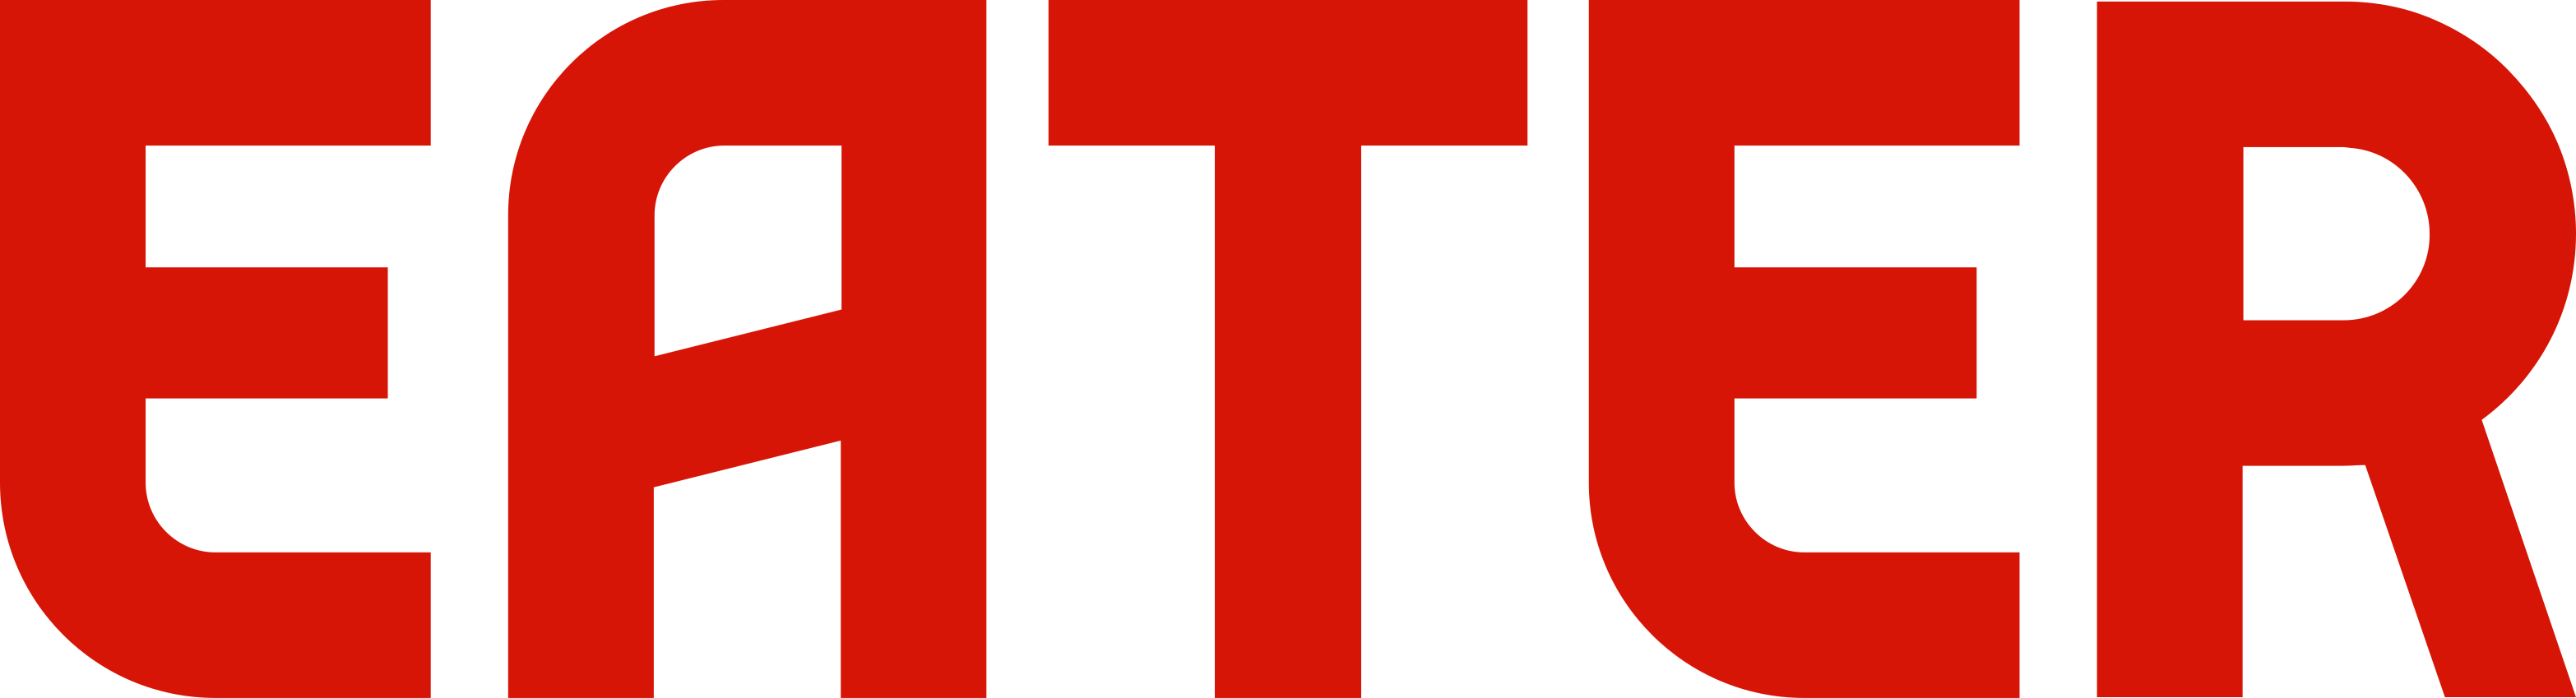 eater seattle logo